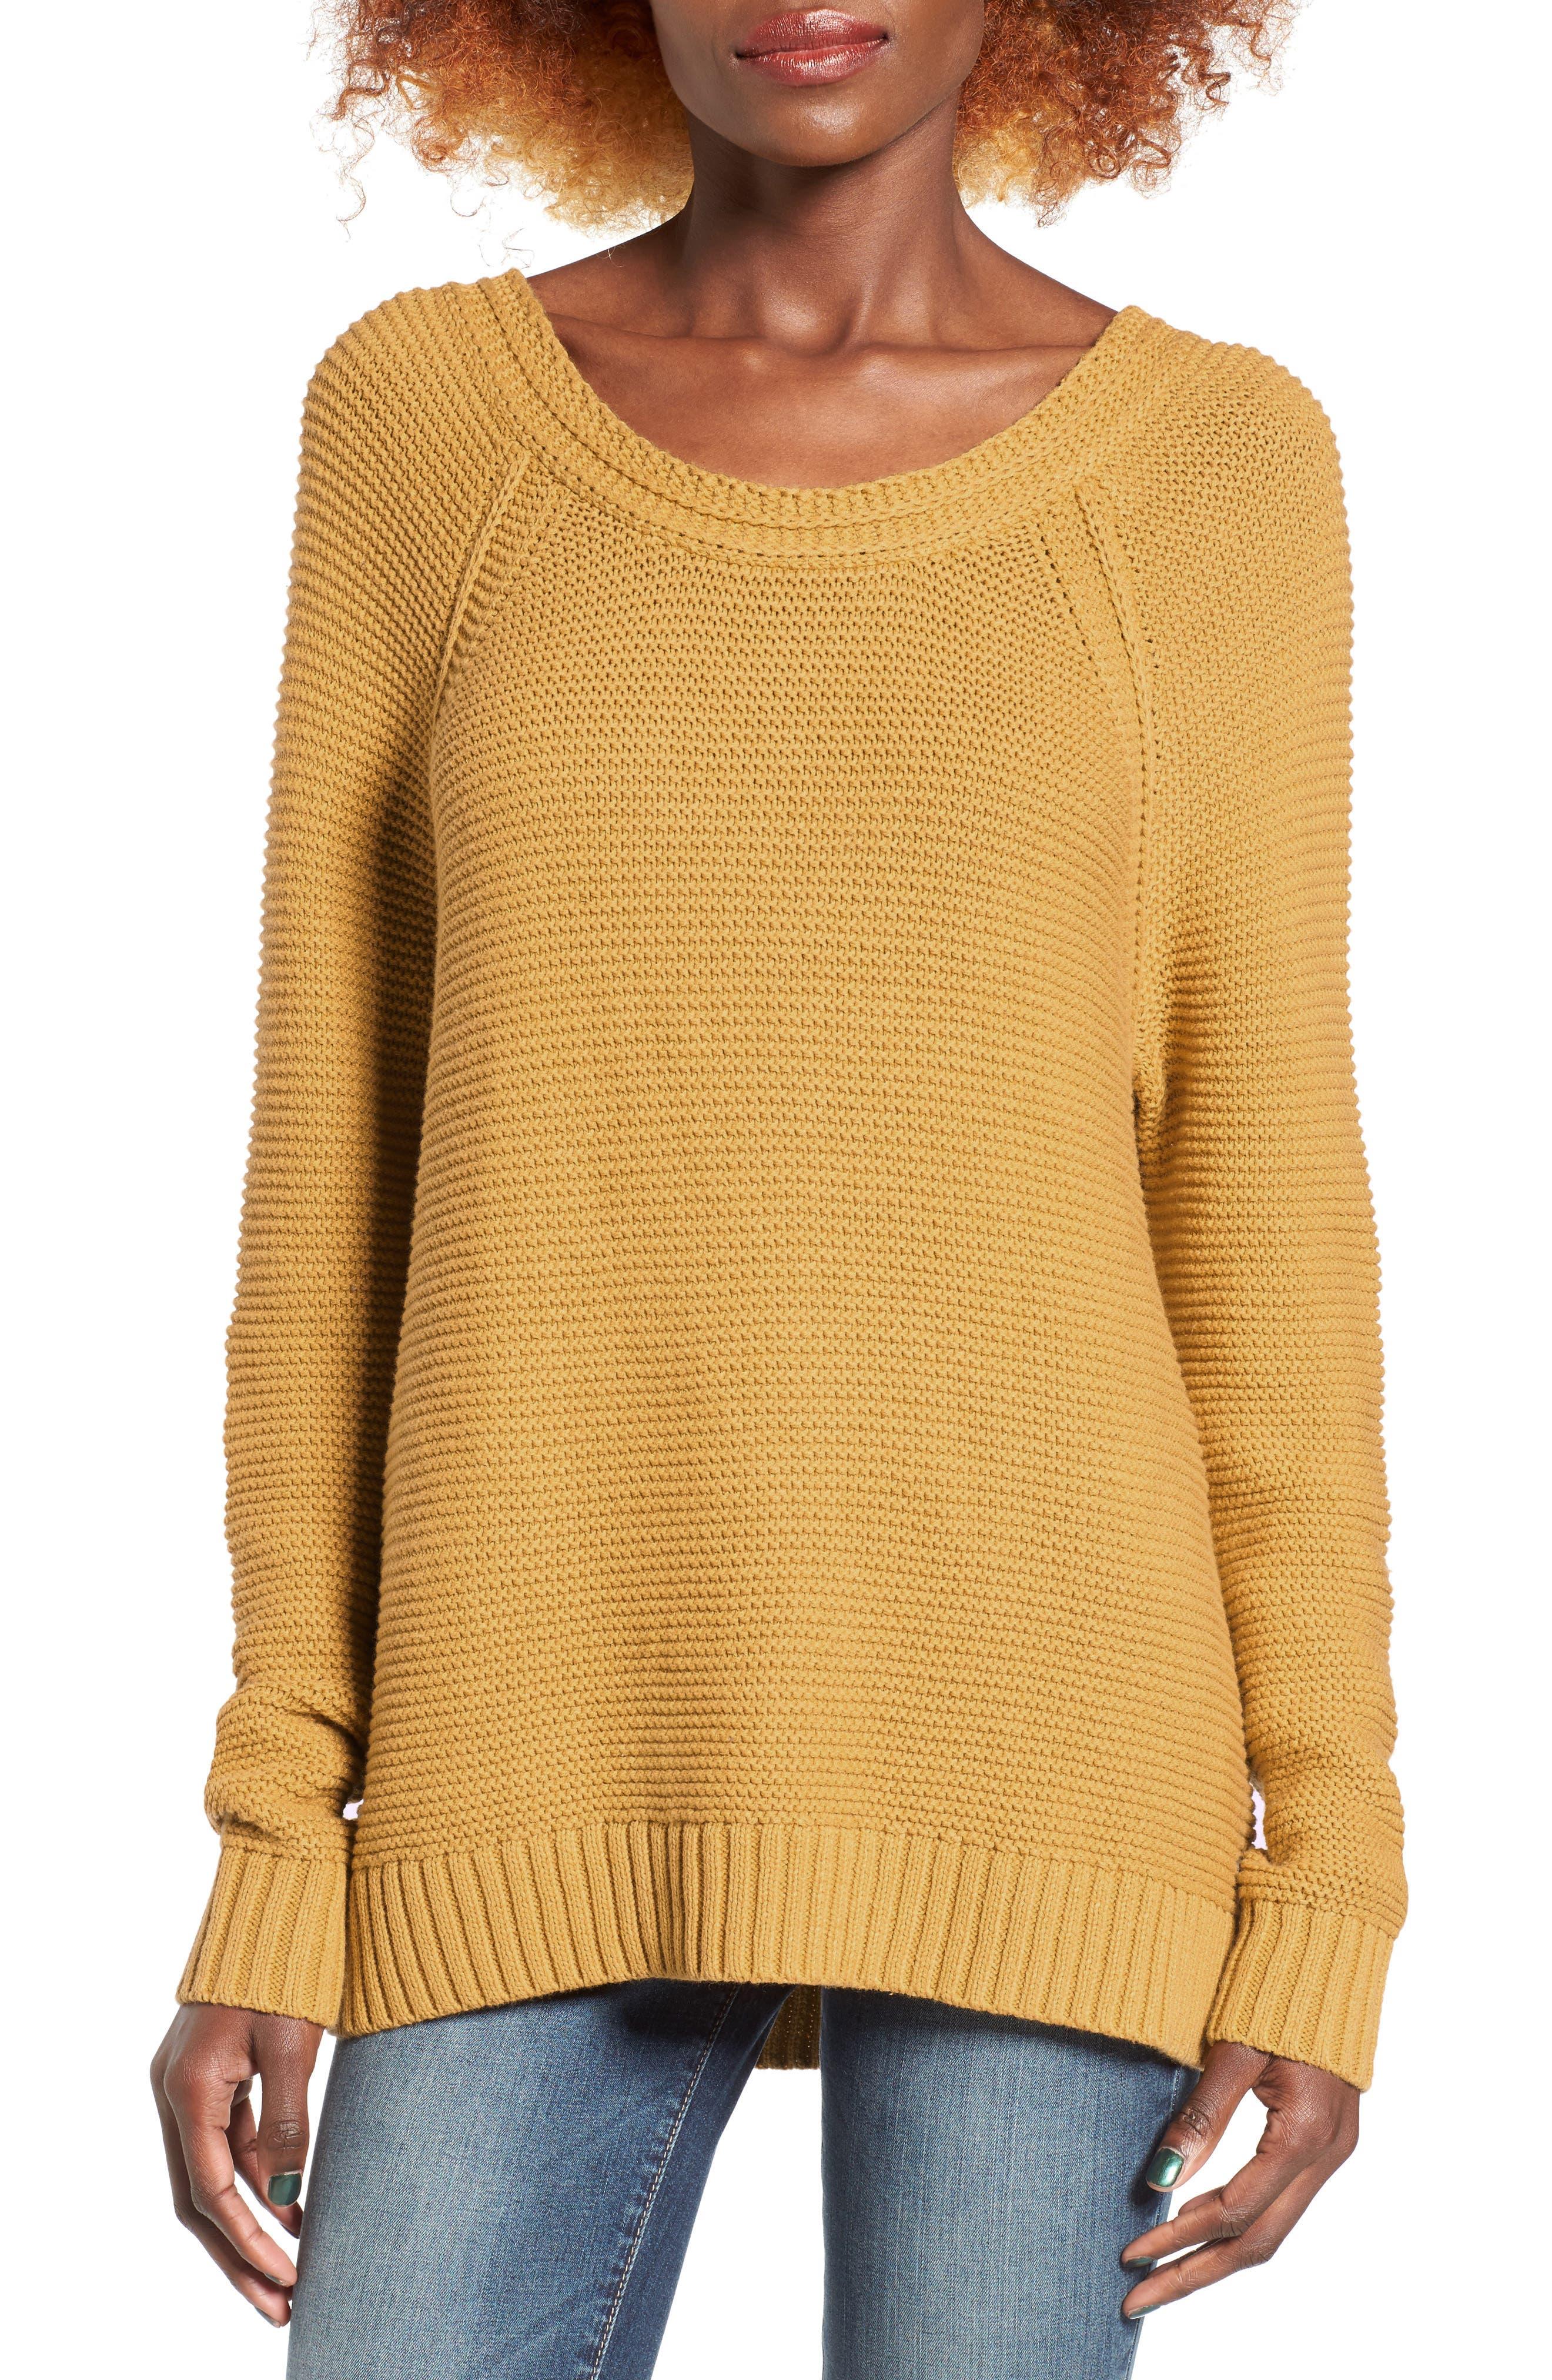 Main Image - Roxy Lost Coastlines Knit Sweater